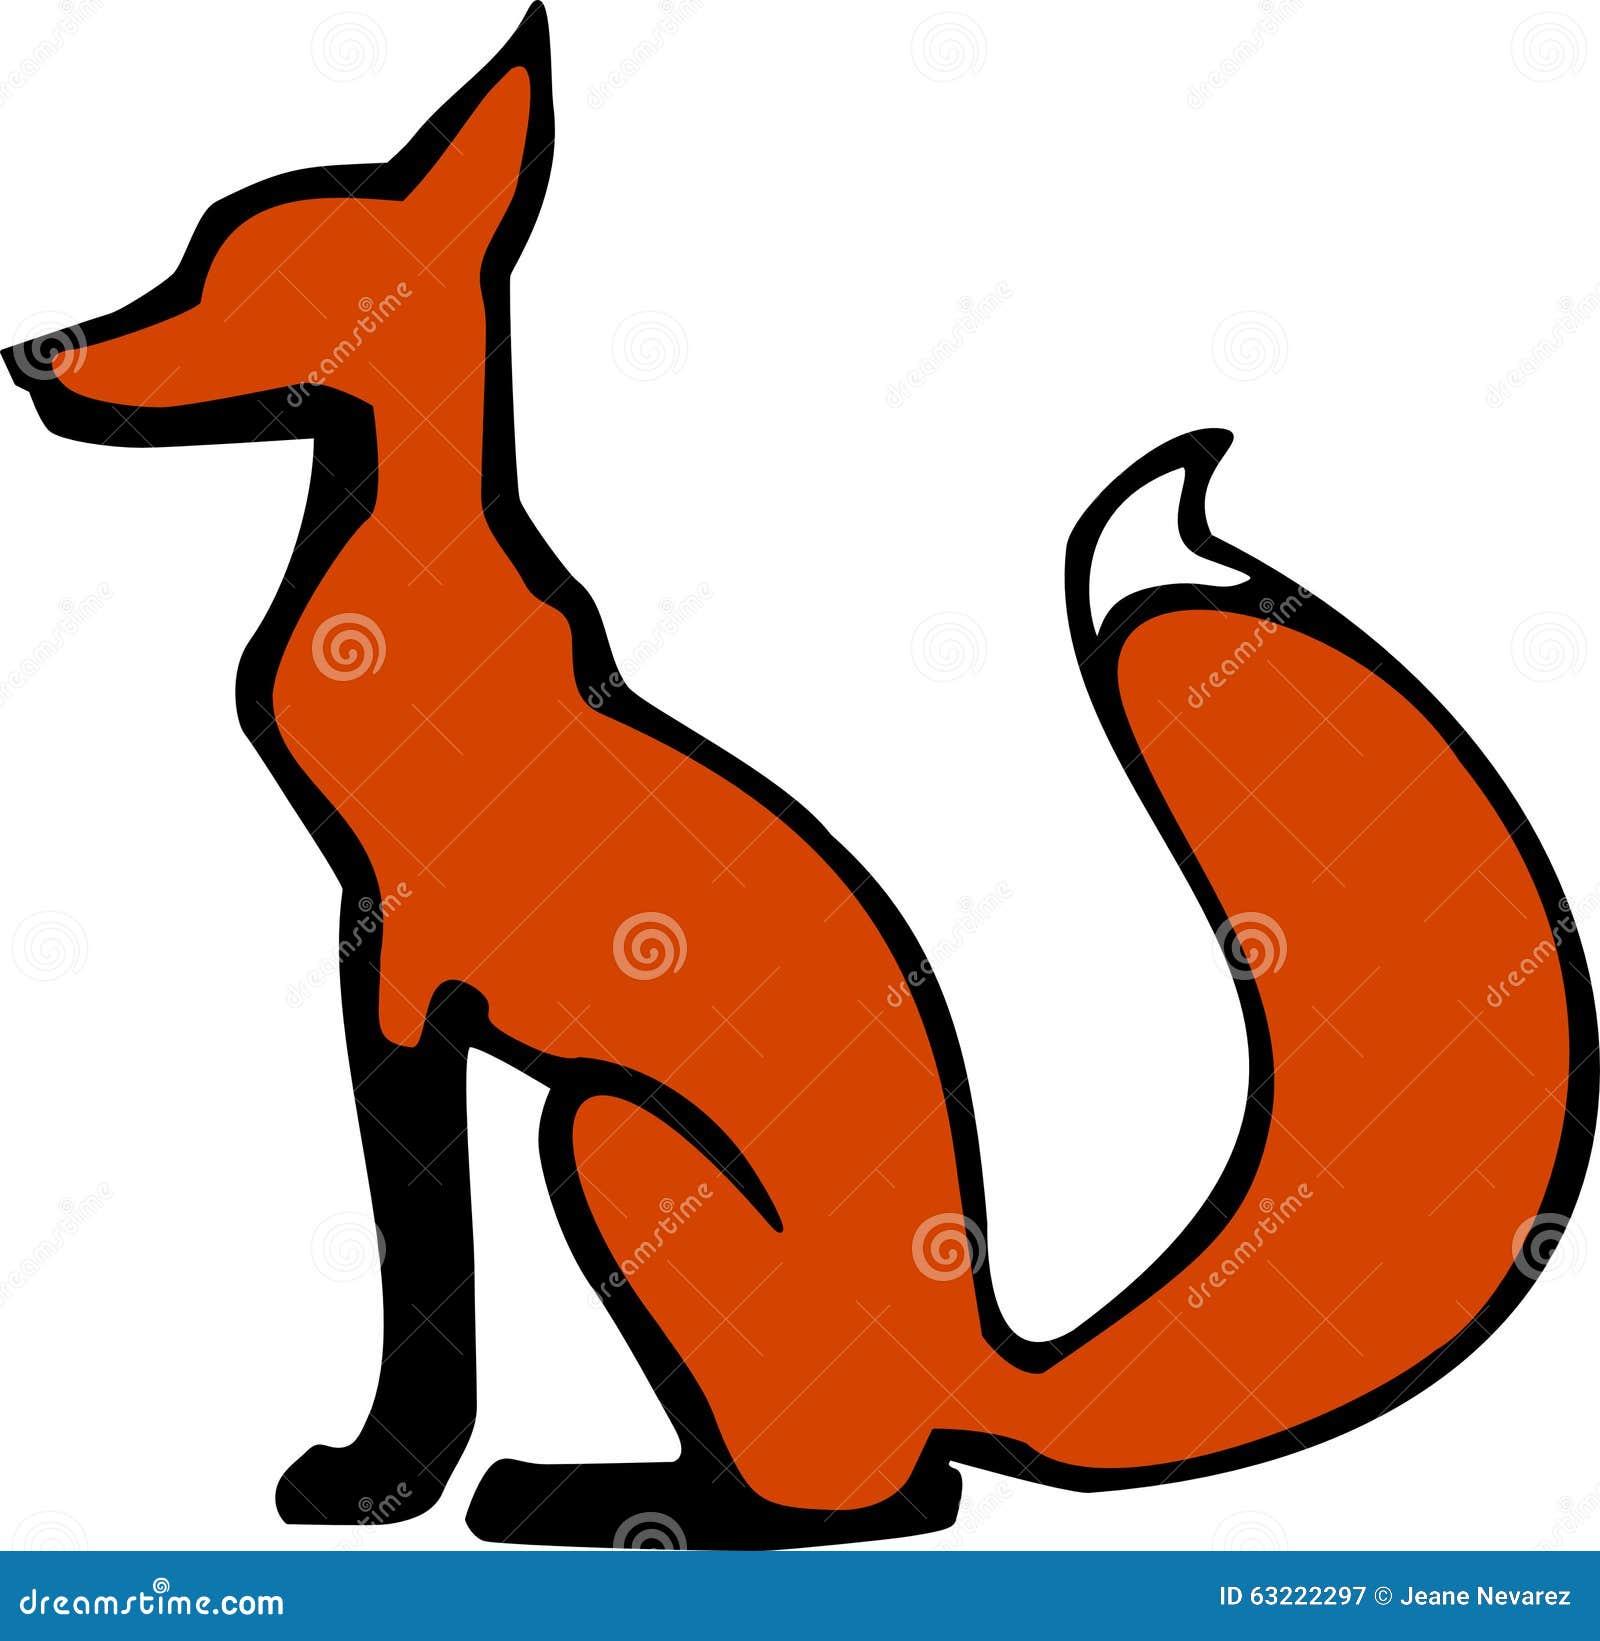 Sitting fox illustration - photo#21